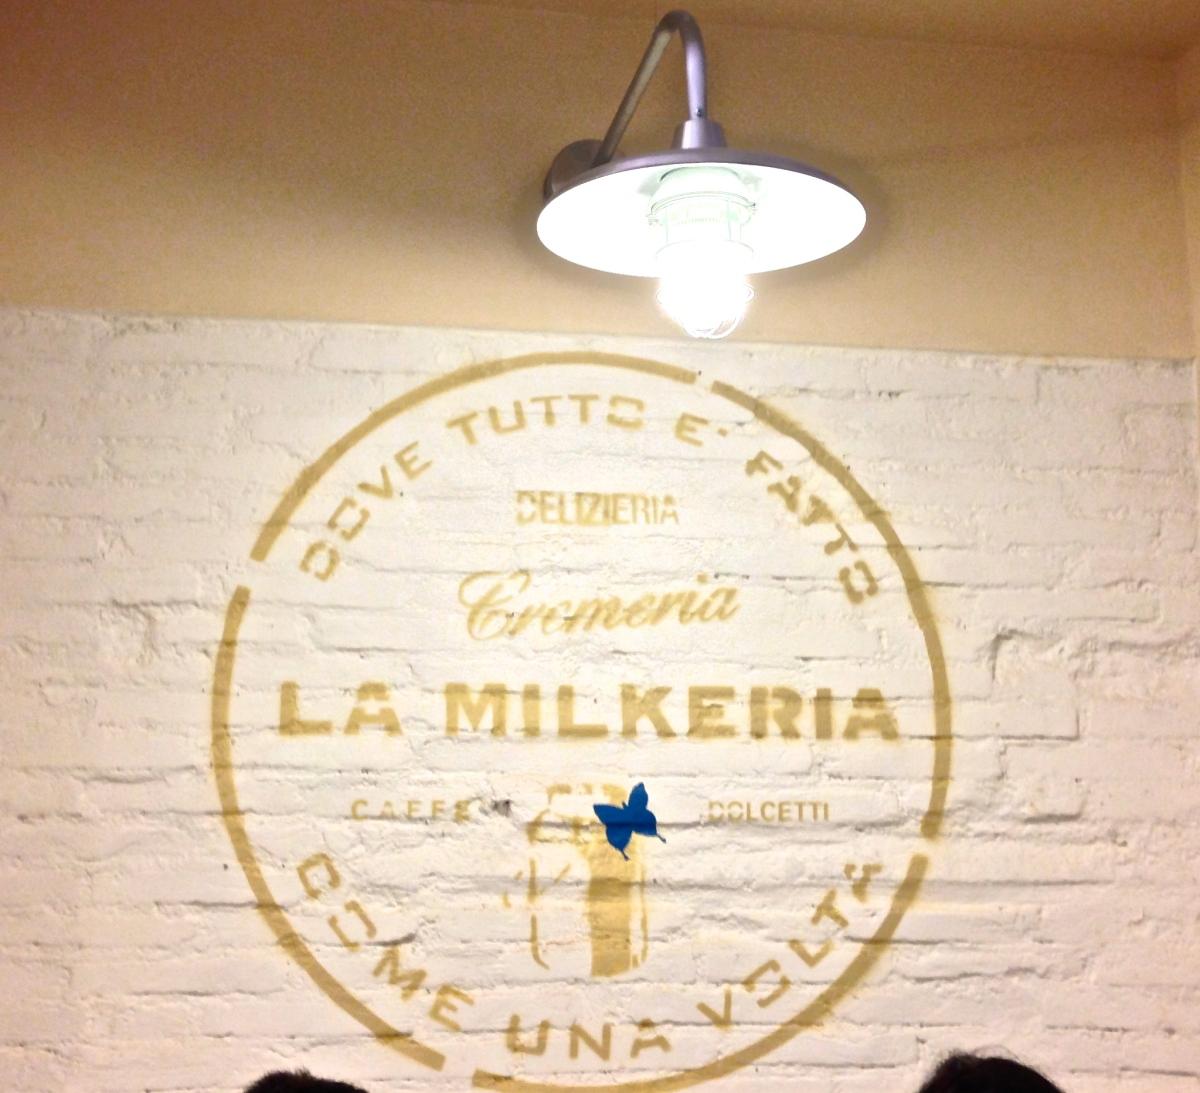 La Milkeria Firenze, Italia Photo by Alexa